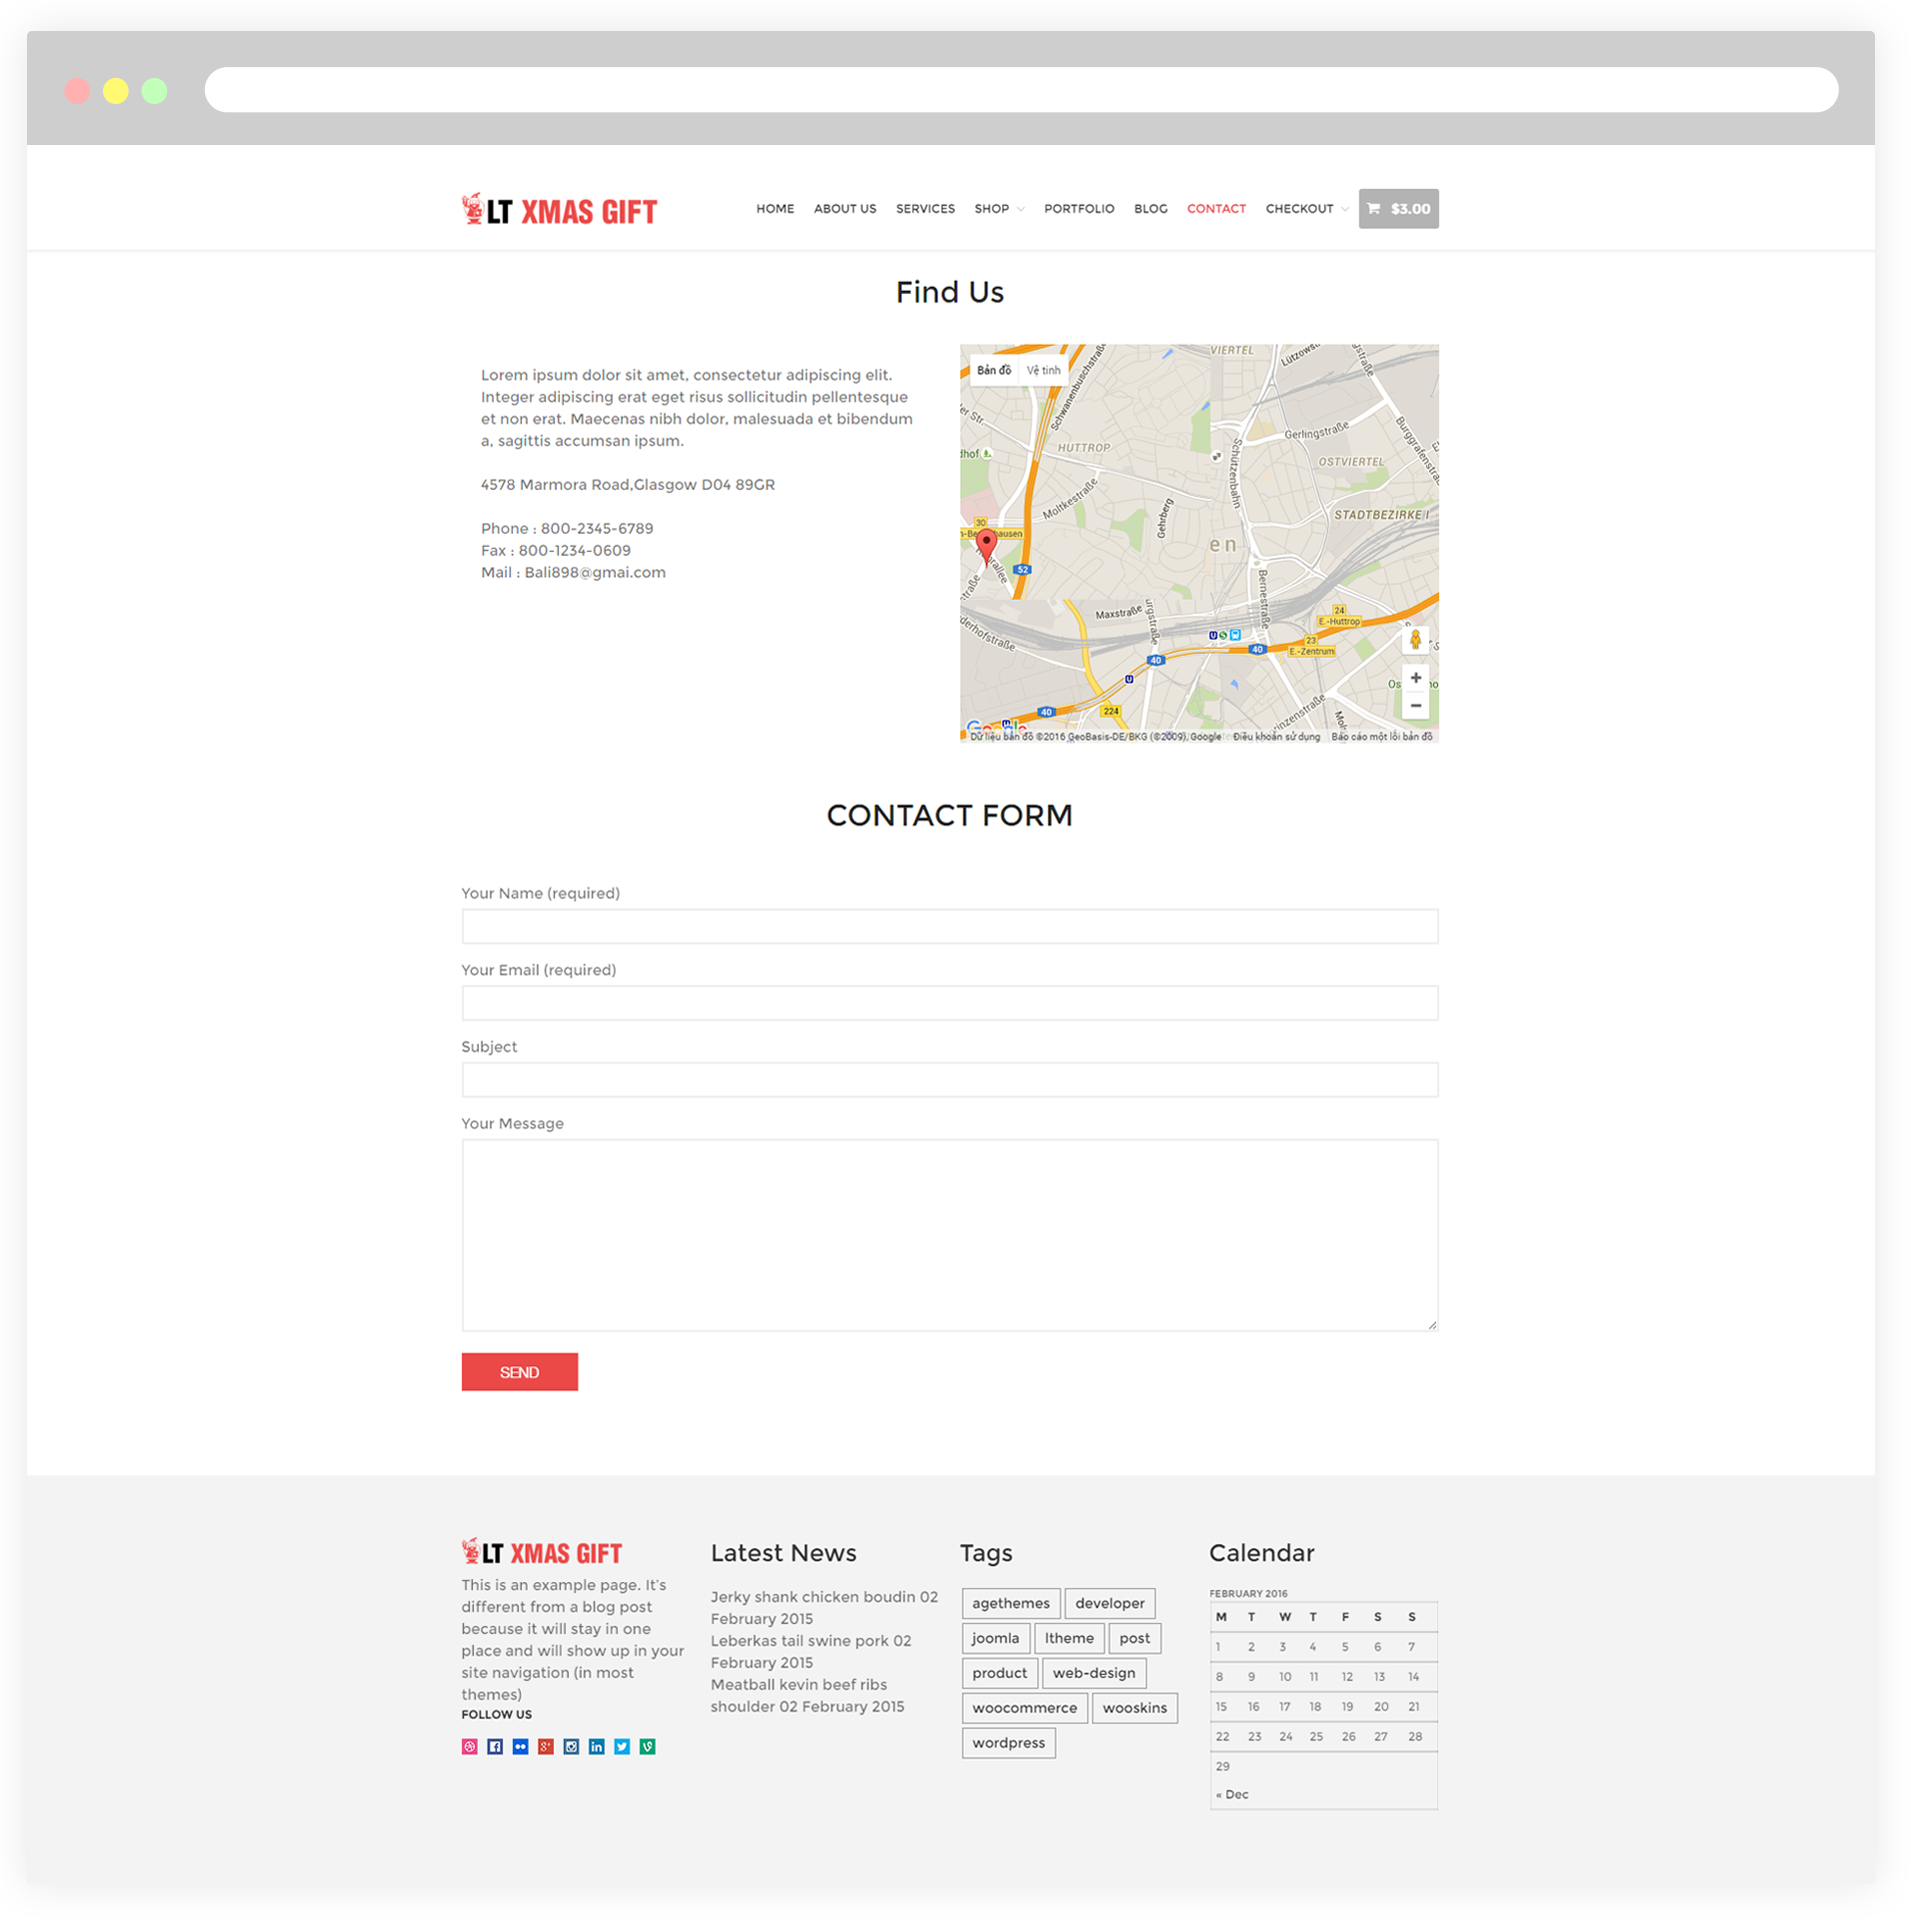 LT XMas Gift  Free Responsive XMas Store  Christmas Shop - Free us map mail